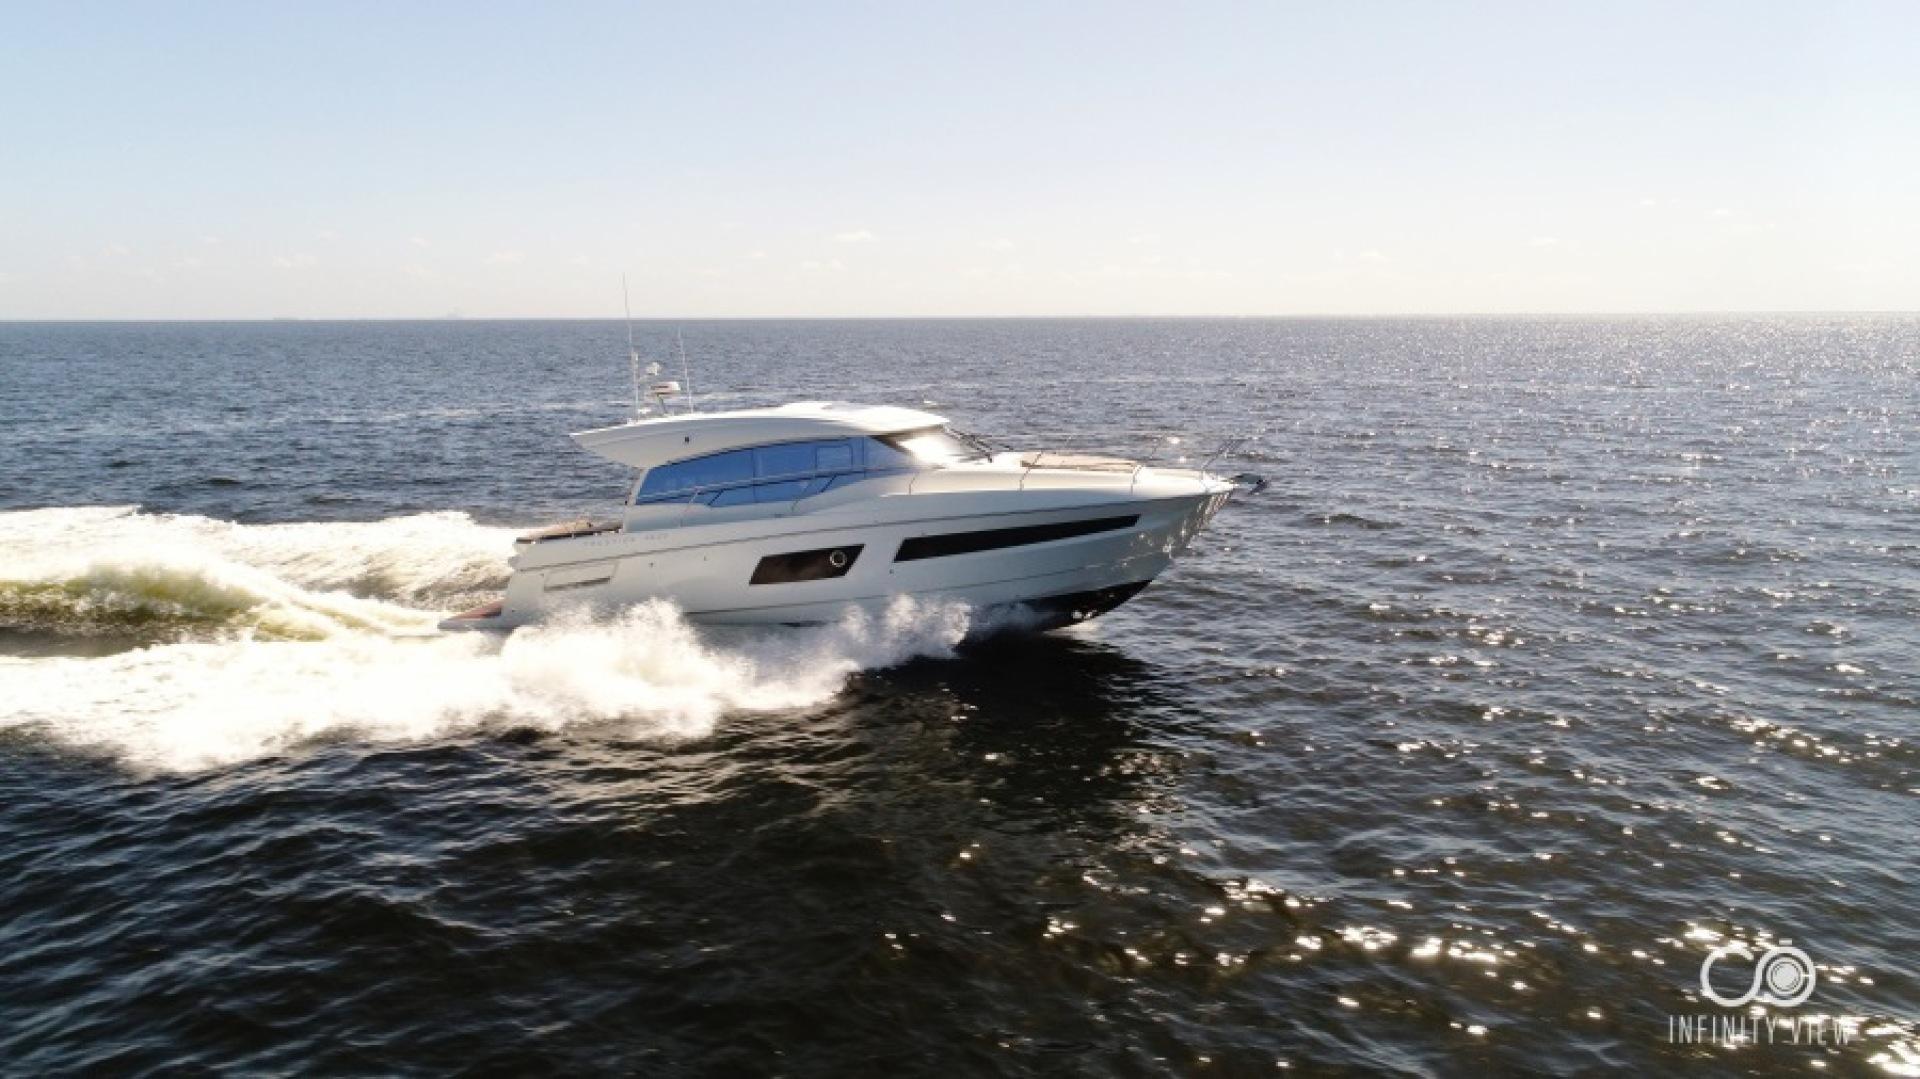 Prestige-460 S 2018-Unforgettable St Petersburg-Florida-United States-2018 Prestige 460 S Yacht  Unforgettable -Running Profile-1444293   Thumbnail